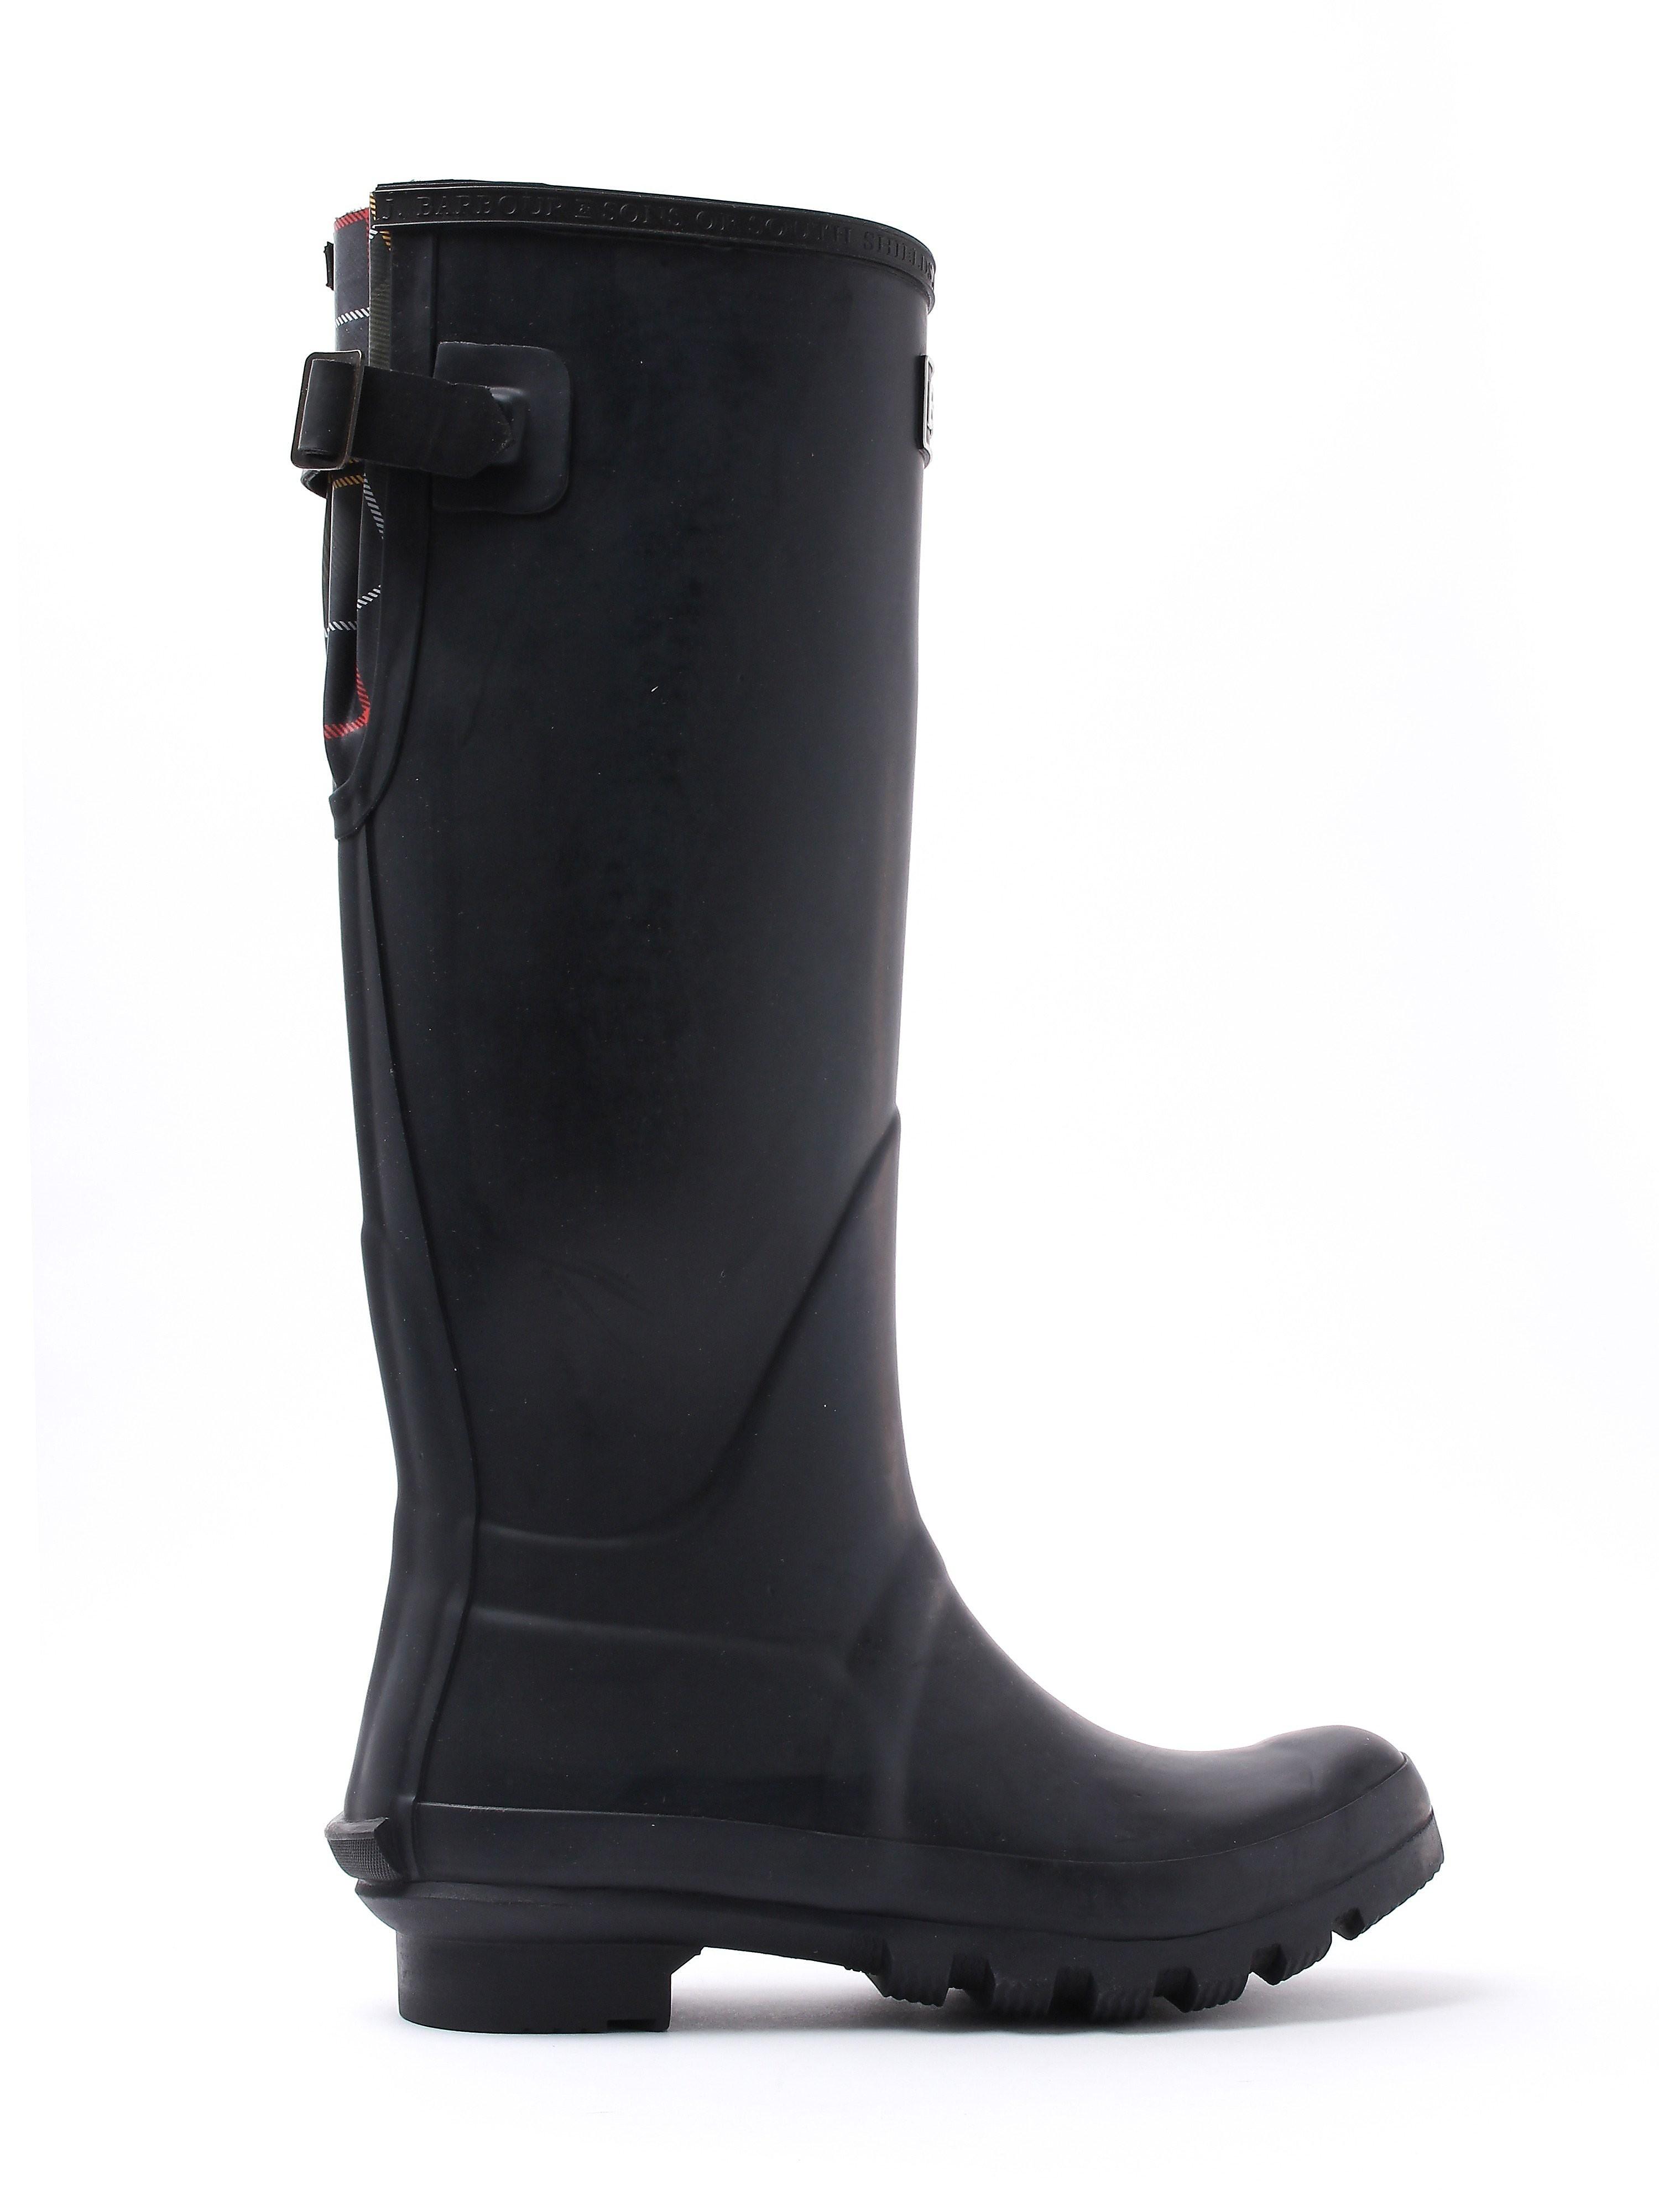 Barbour Women's Jarrow Tall Rubber Wellington Boots - Black